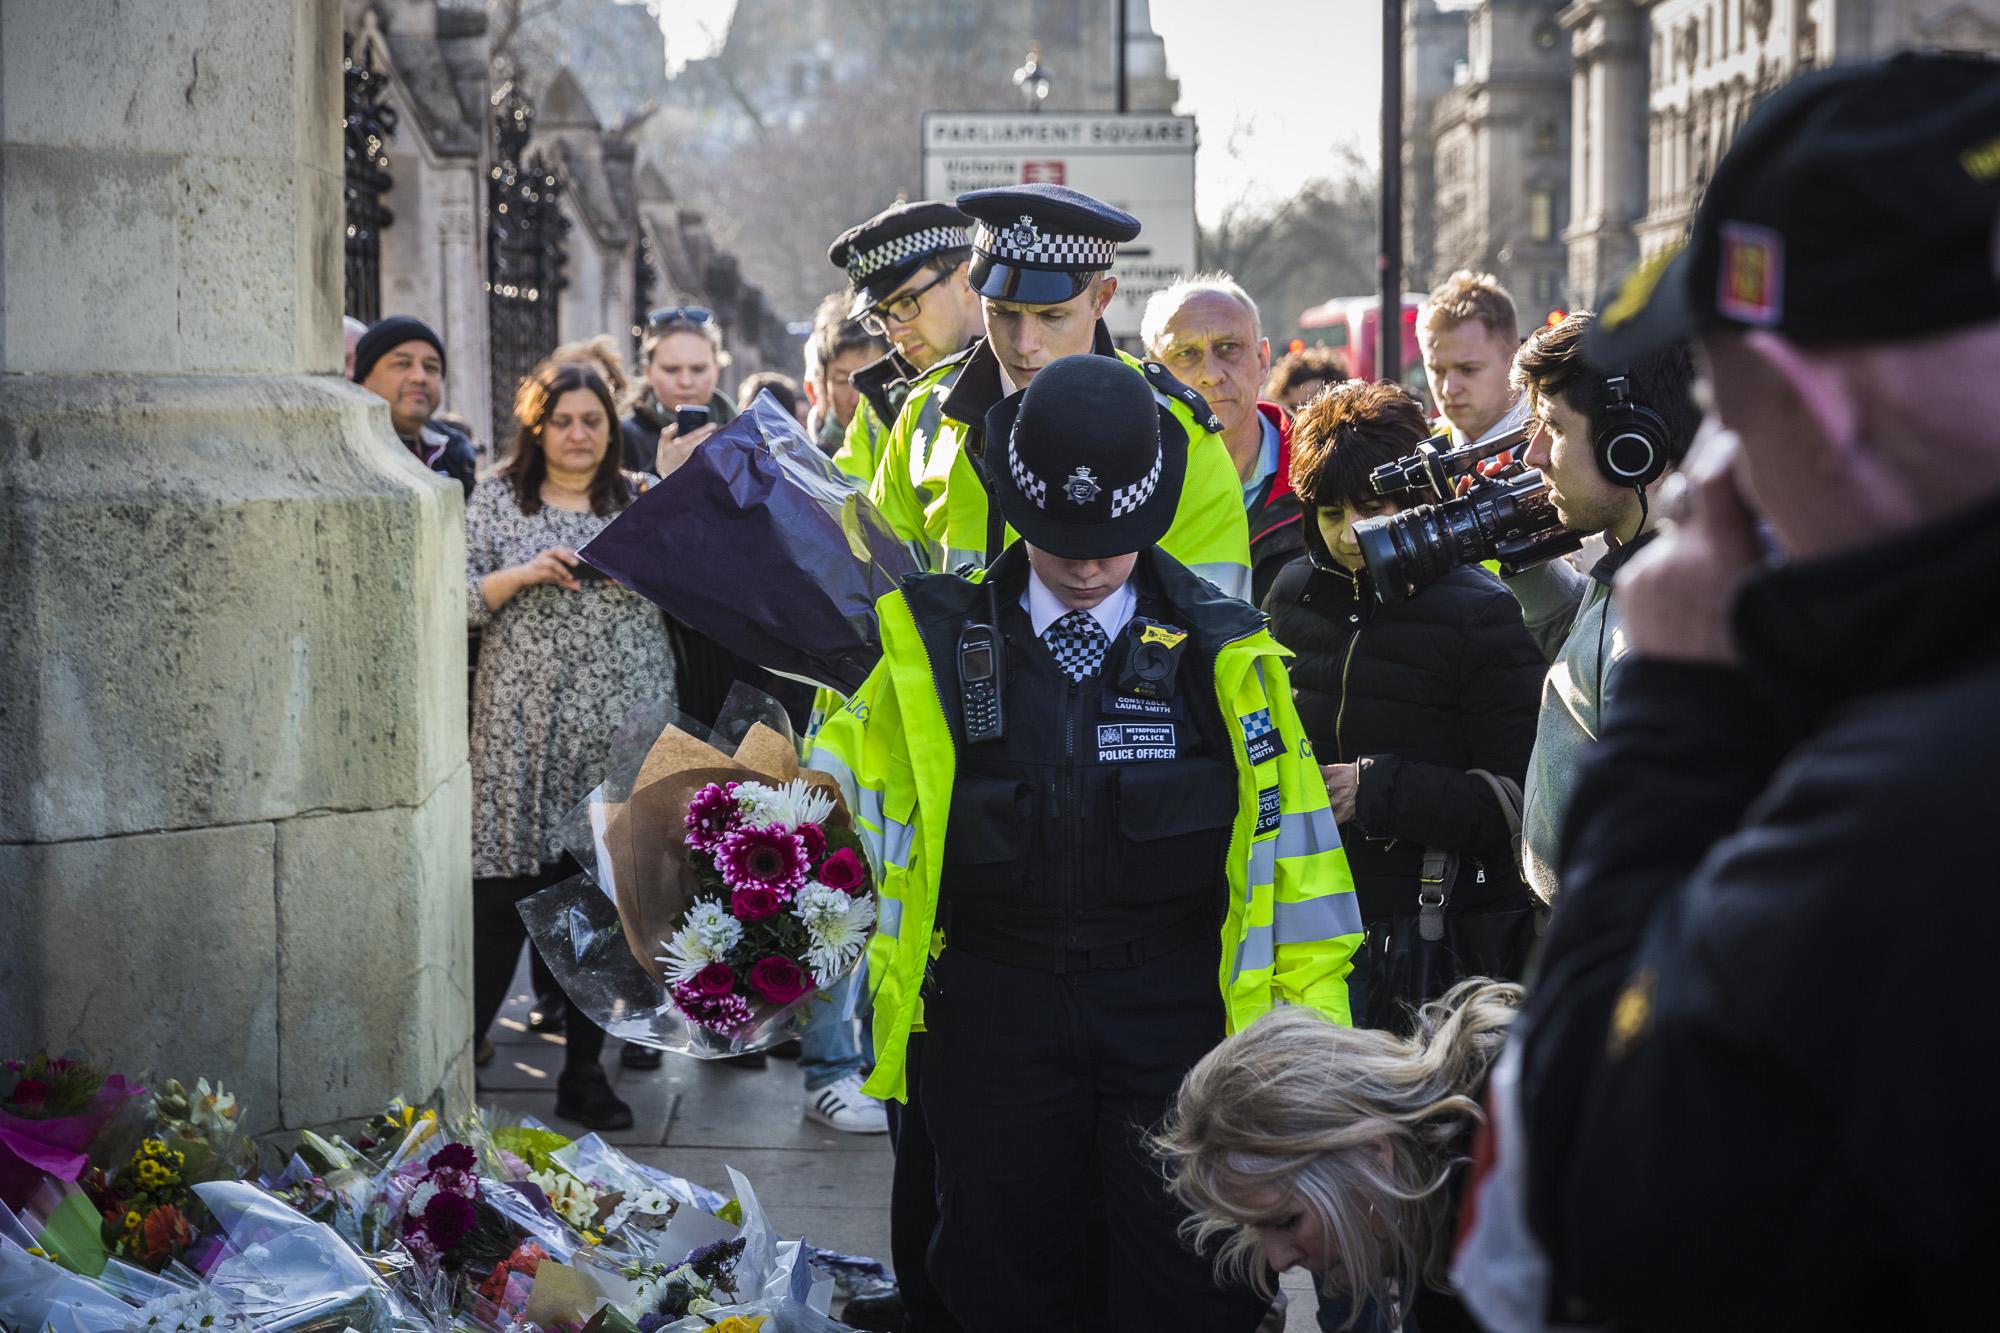 London_Attack_Hope_Not_Hate-19.jpg